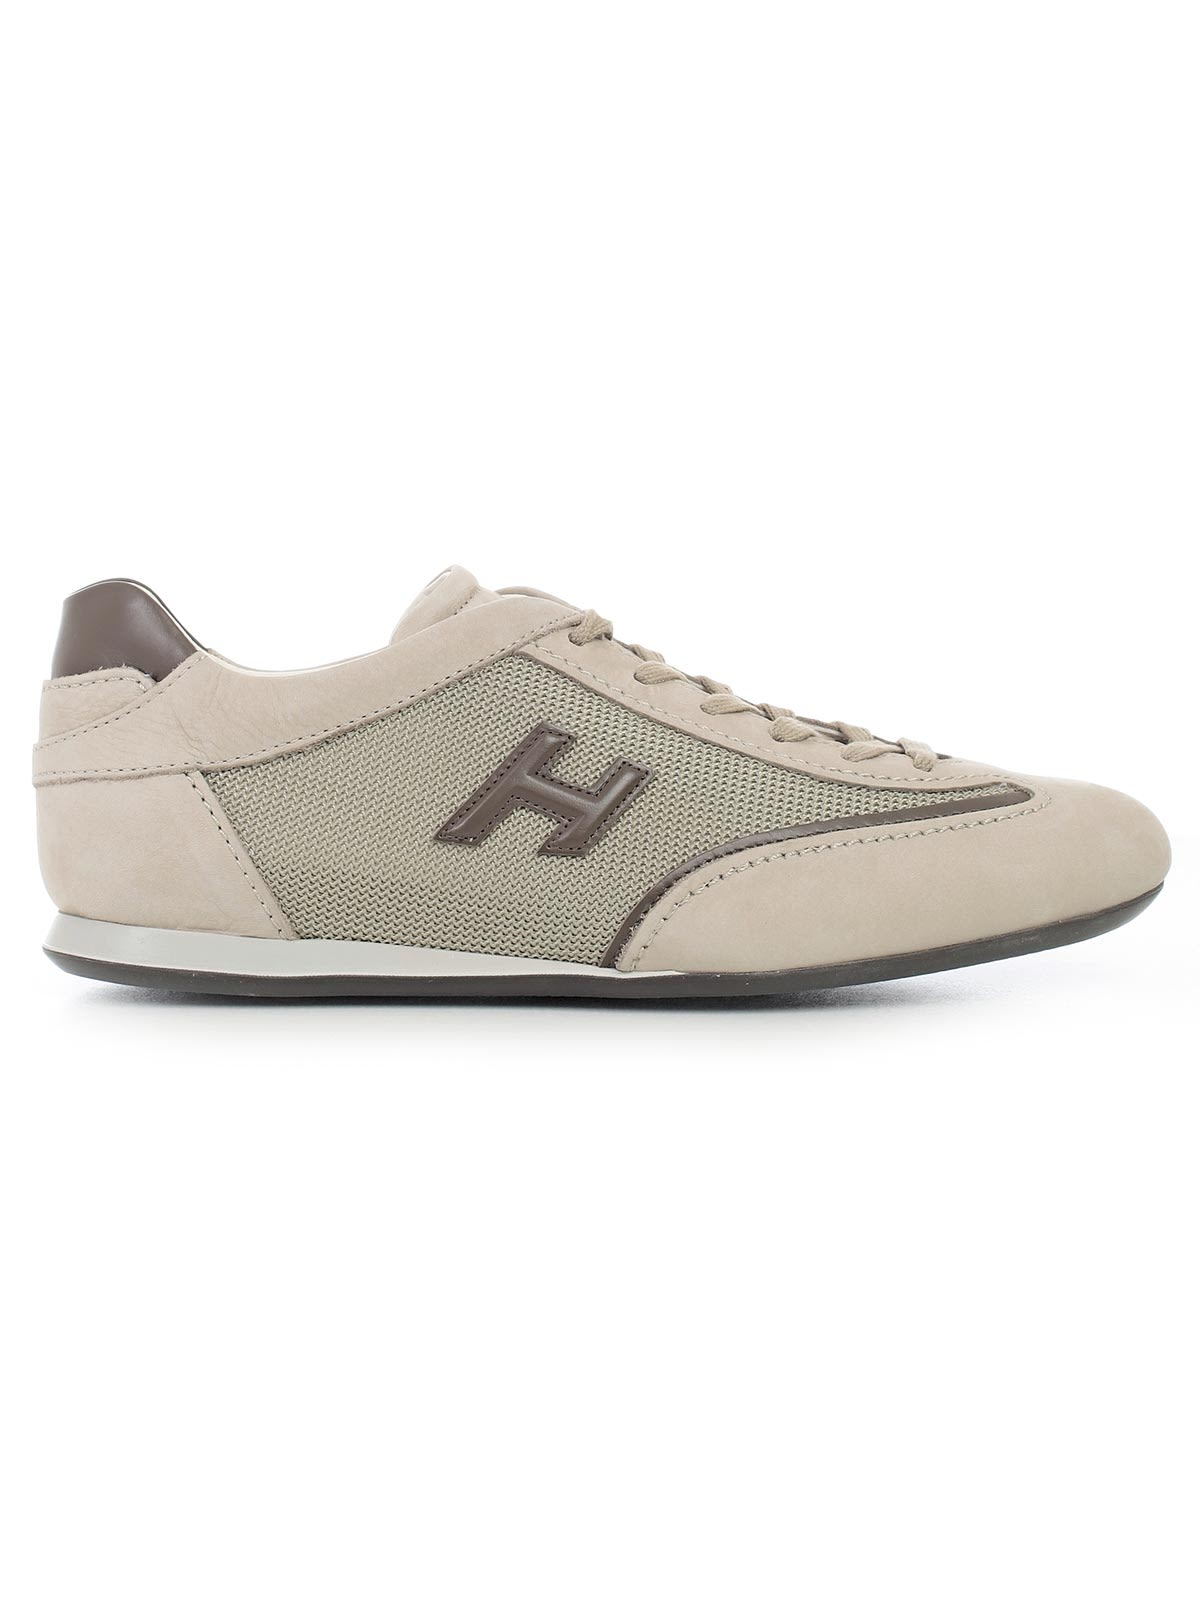 running R261 sneakers - Nude & Neutrals Hogan aKlXe